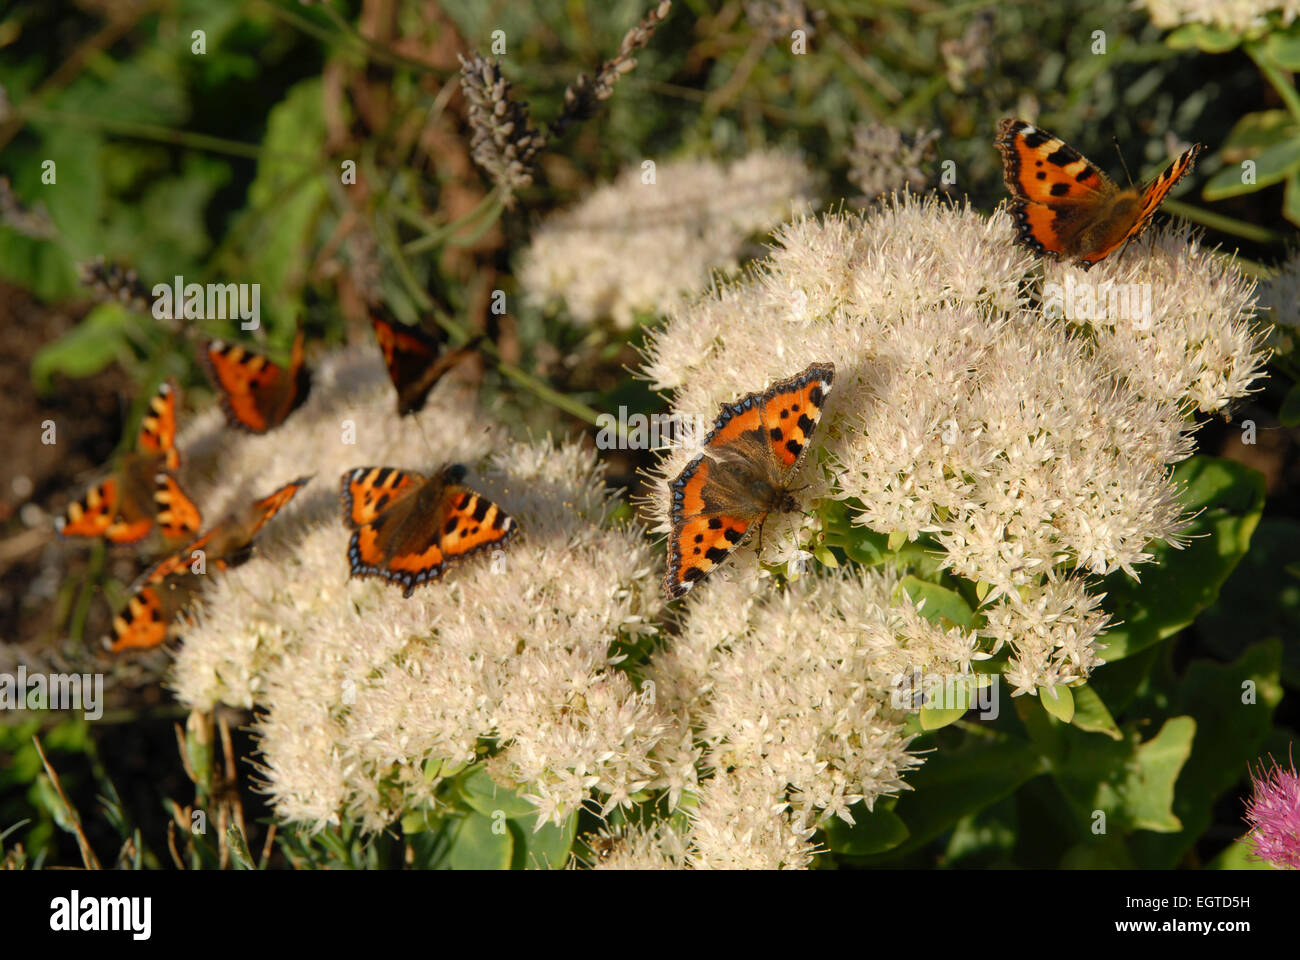 Mass of Small Tortoiseshell Butterflies, Aglais urticae, feeding on Sedum spectabile or Ice-plant. - Stock Image